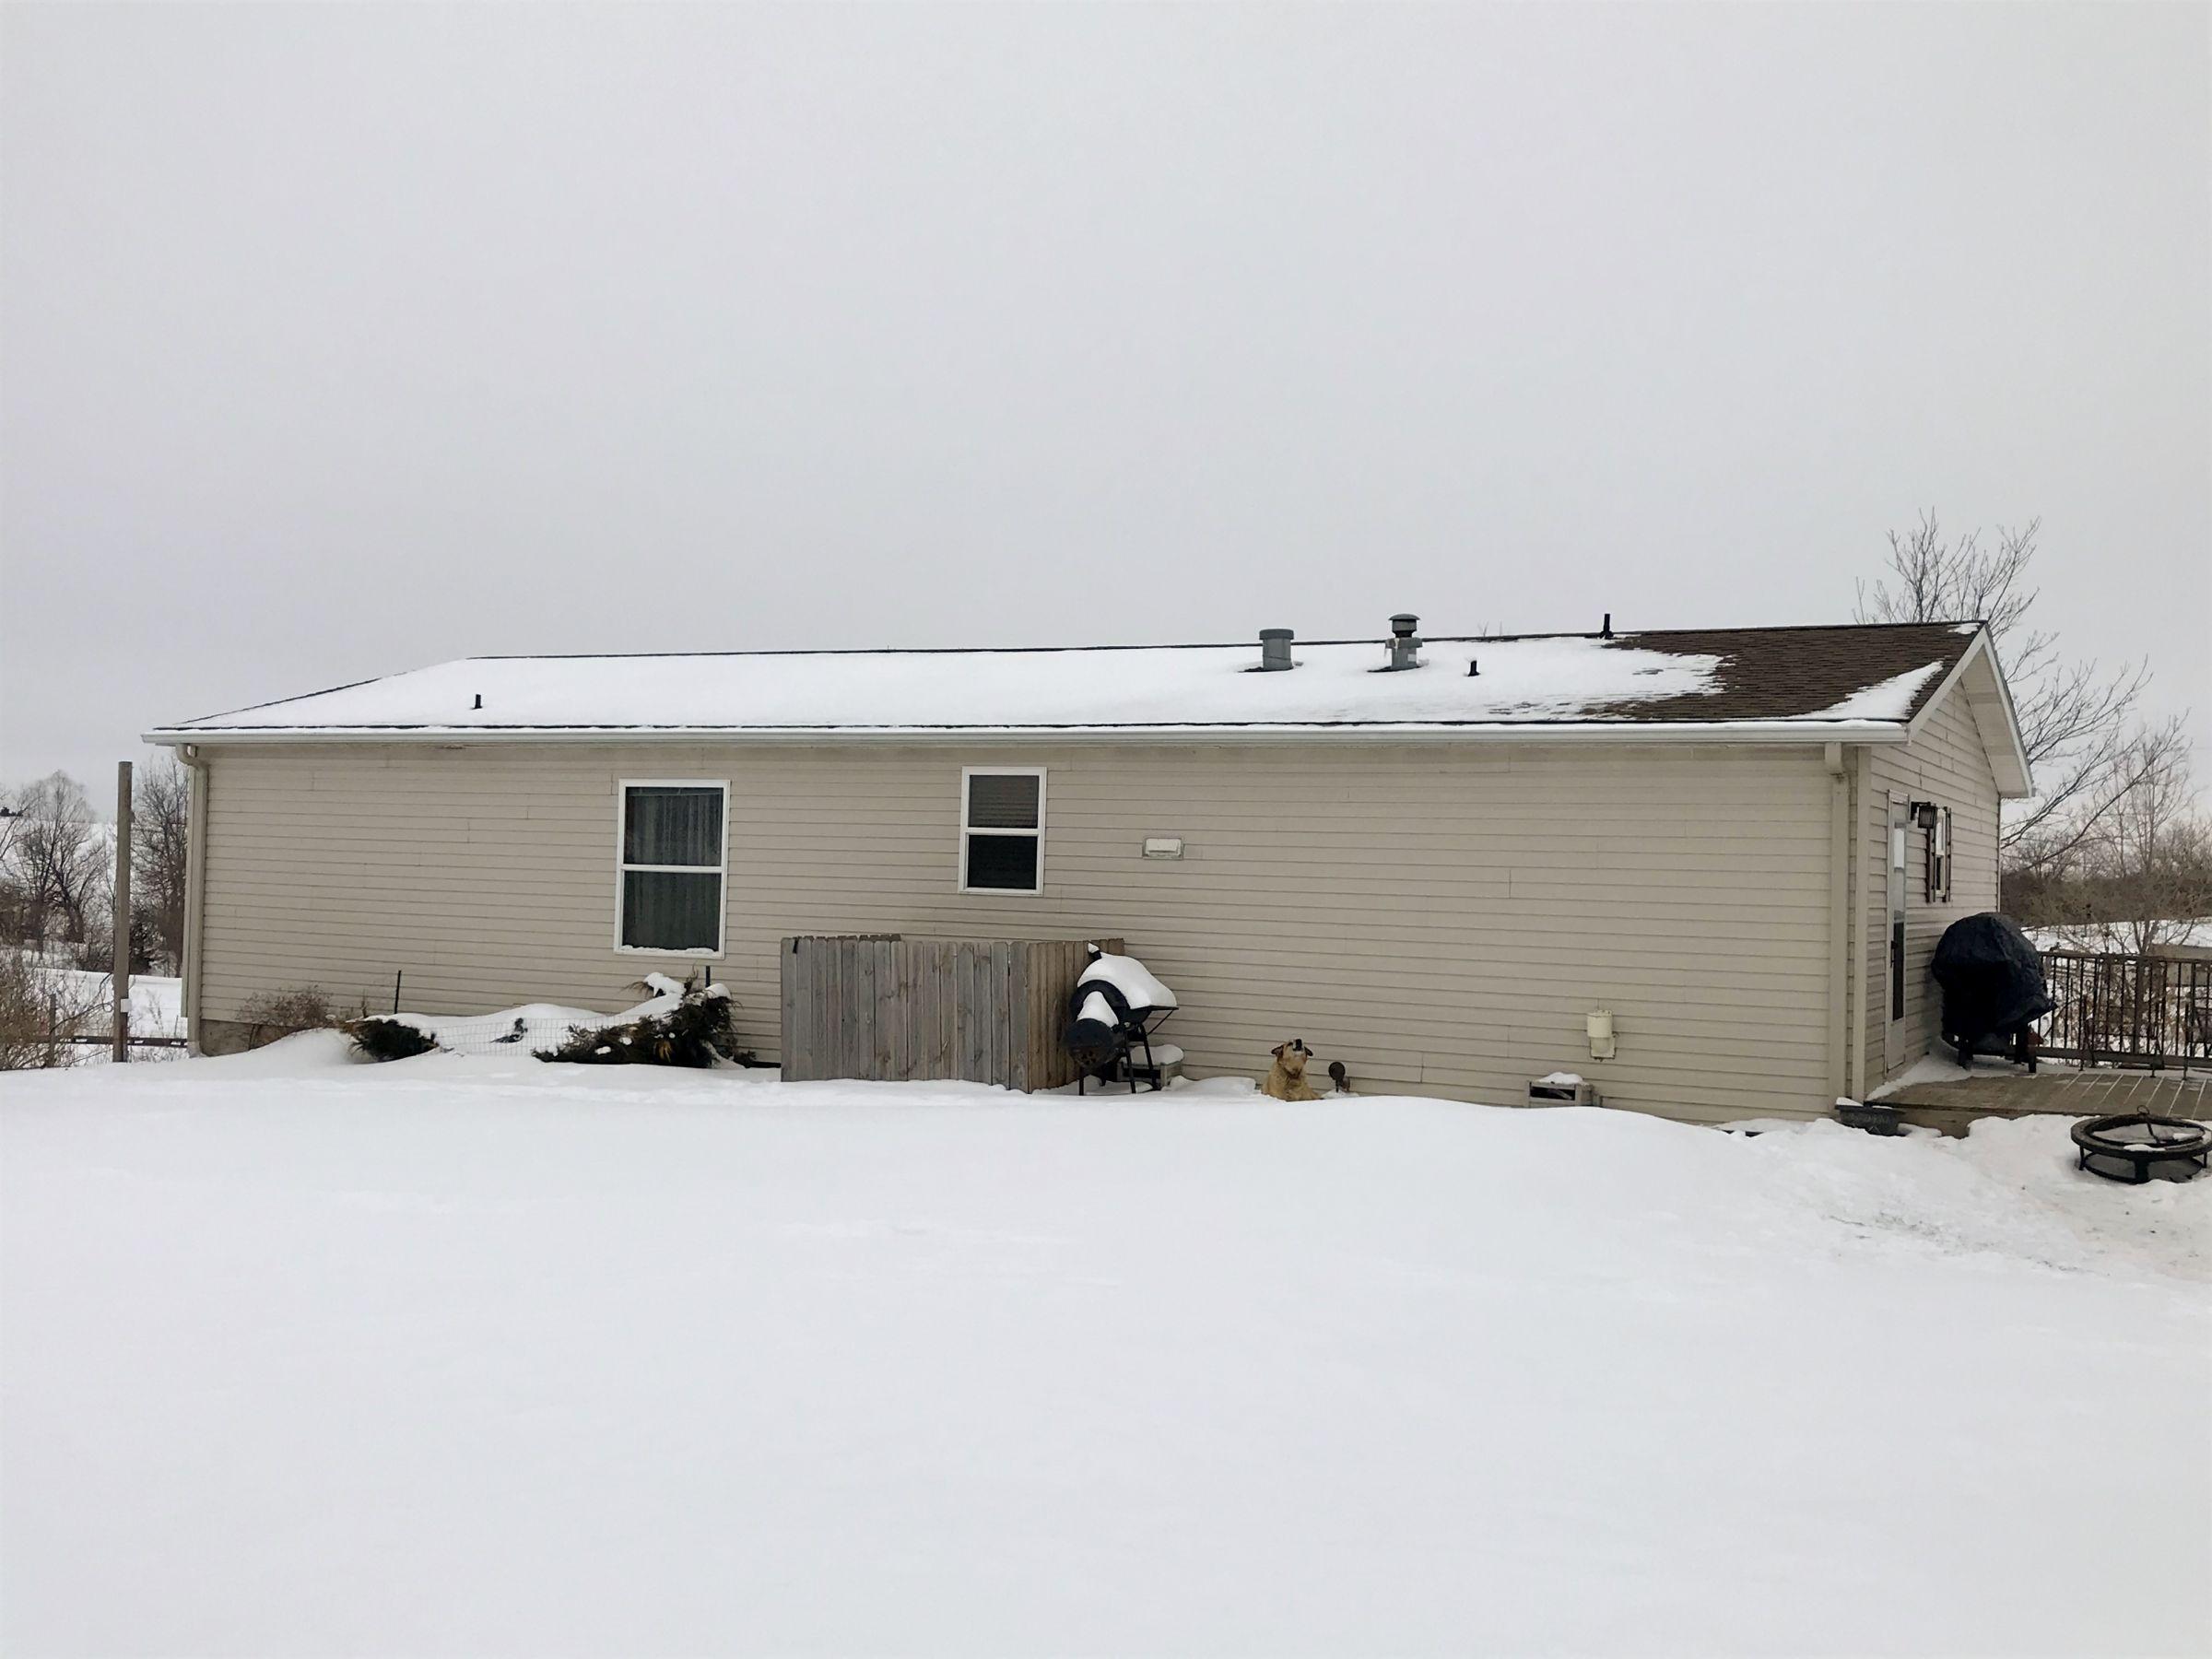 residential-warren-county-iowa-7-acres-listing-number-15327-4-2021-02-17-135108.JPG